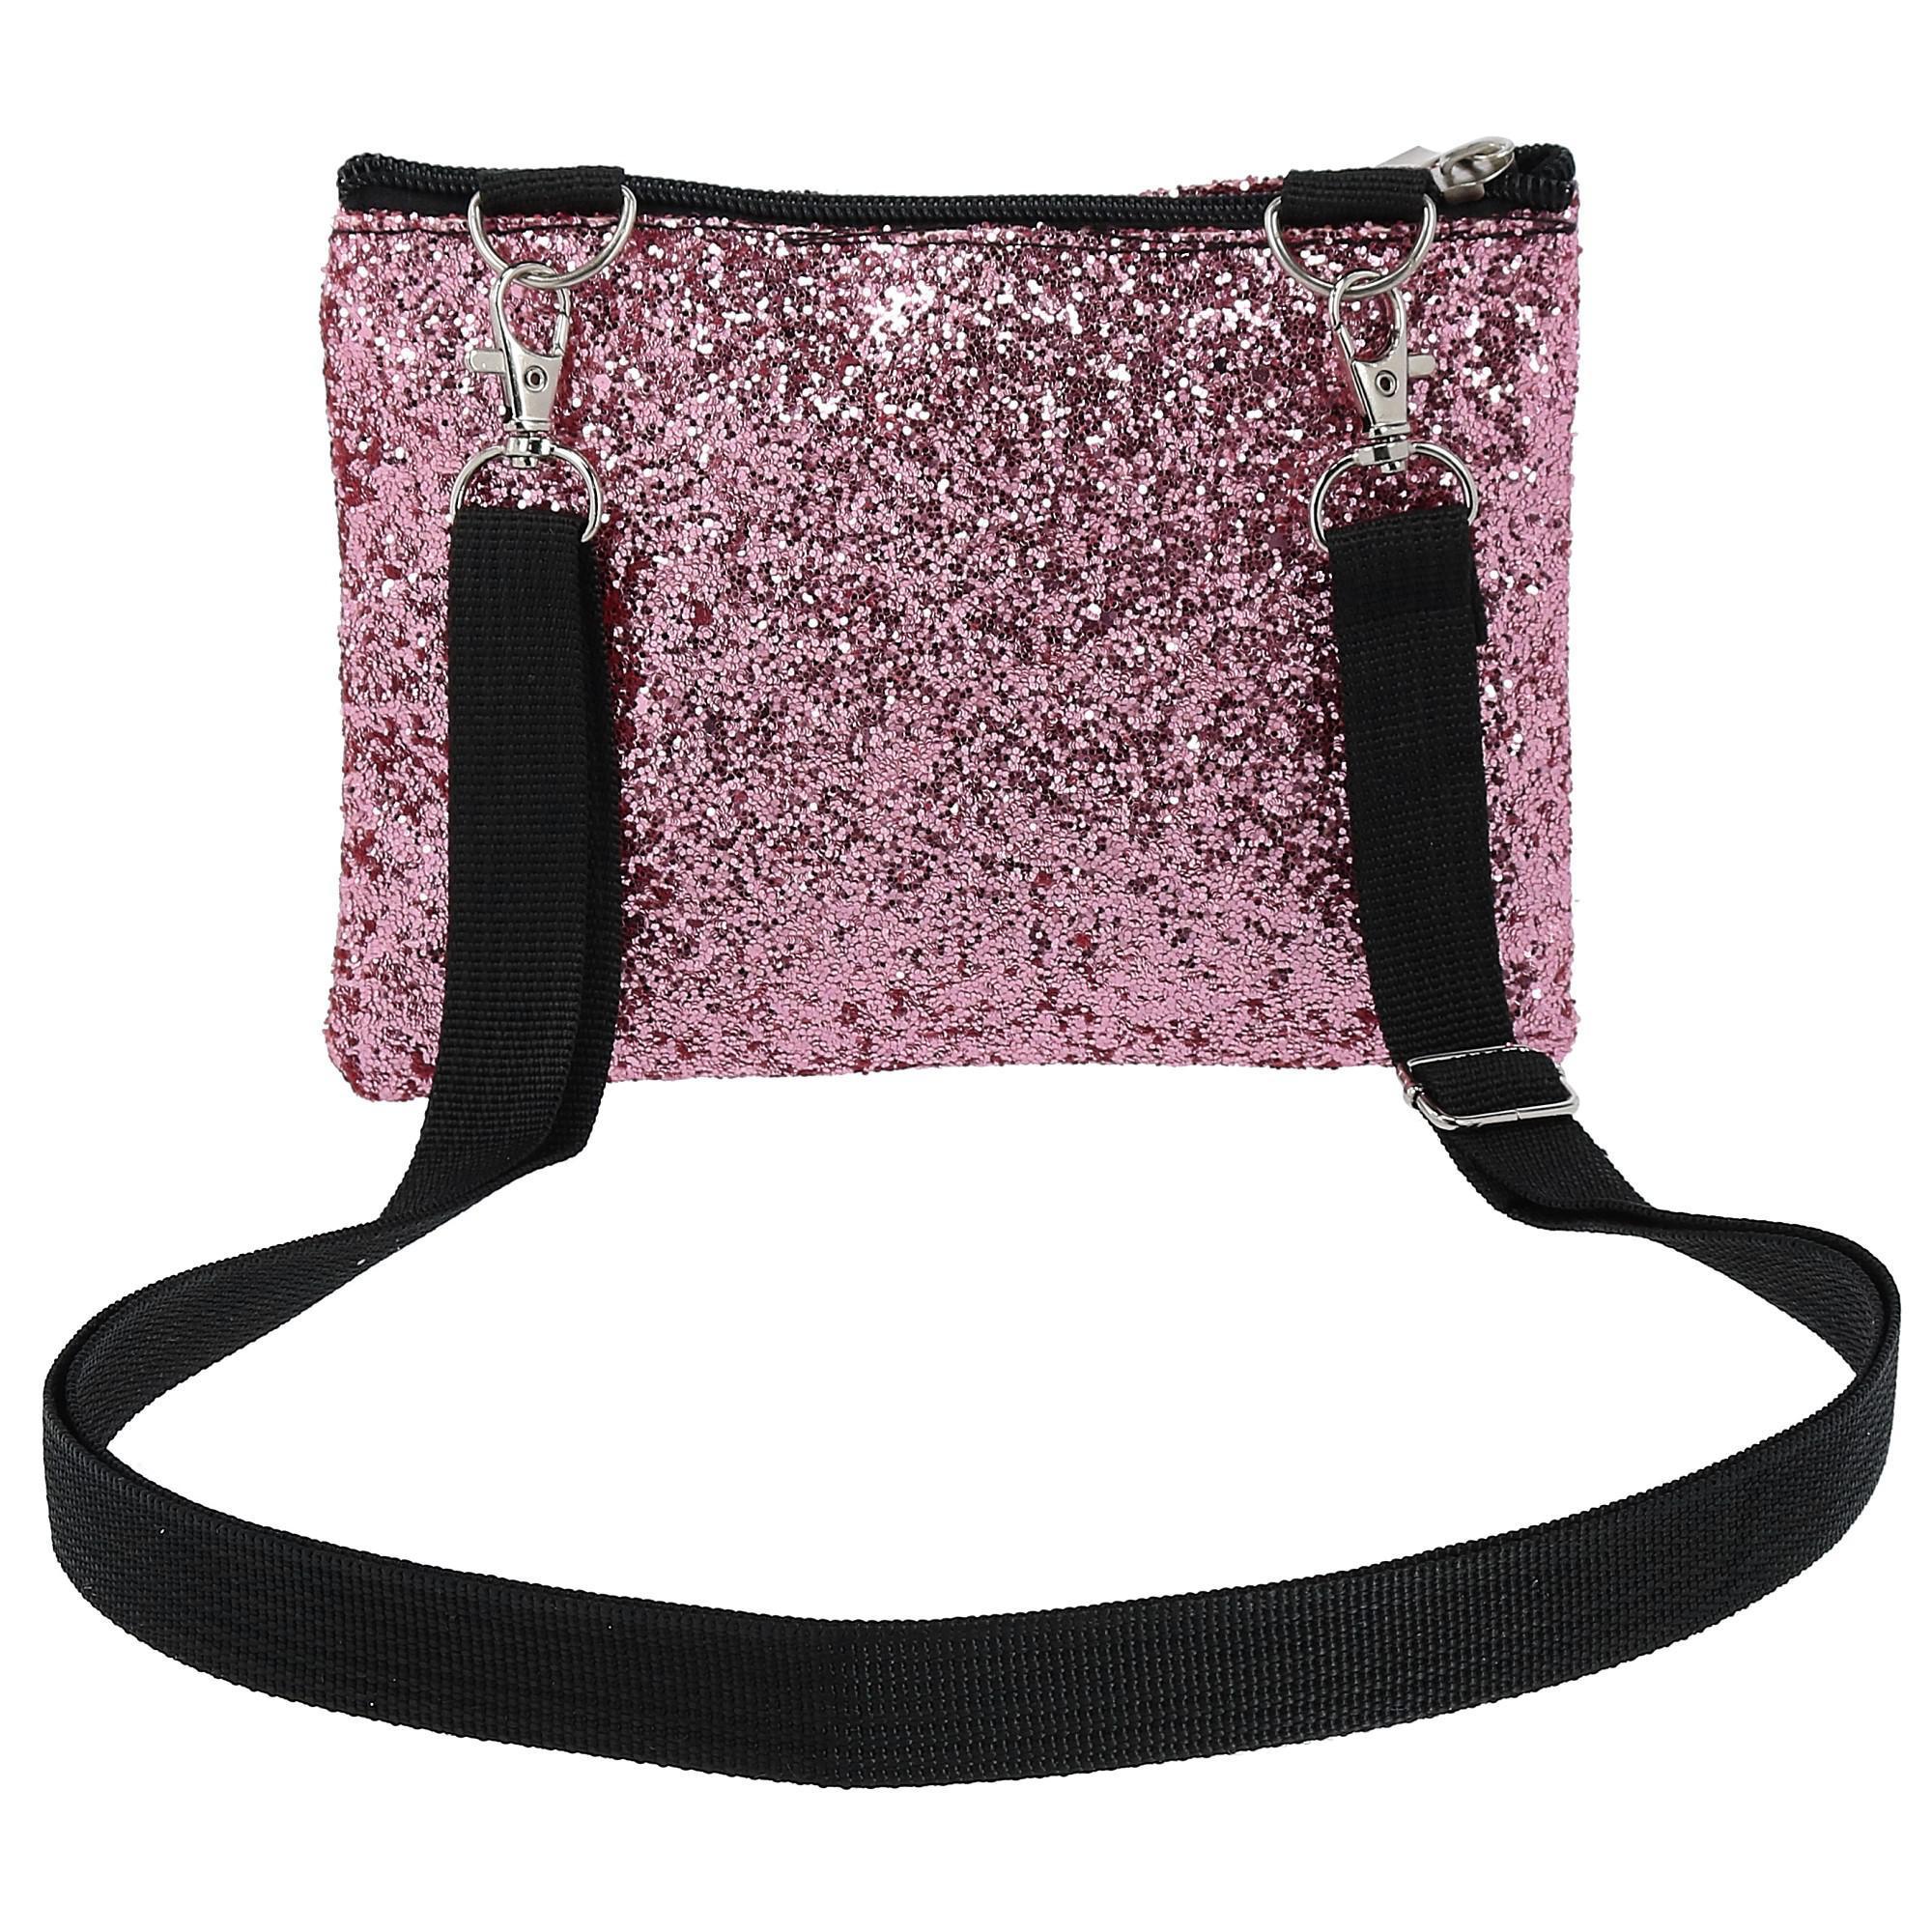 New-2-Moda-Fashion-Glitter-Waist-Pack-Convertible-Cross-Body-Bag thumbnail 16